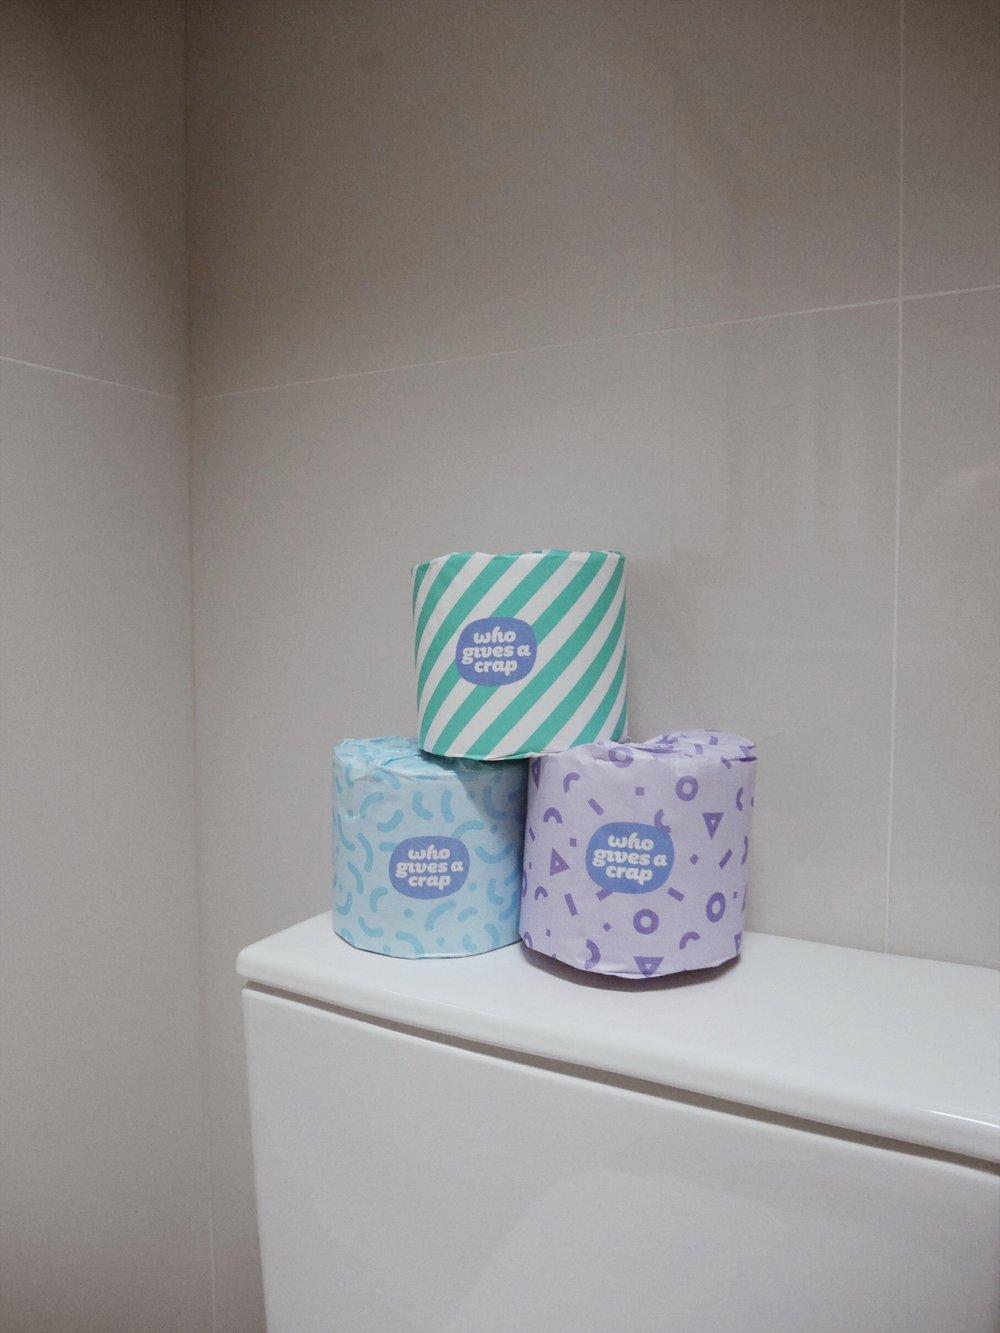 〰️ Toilet paper that builds toilets - Sustainable toilet paper that's also a social enterprise.